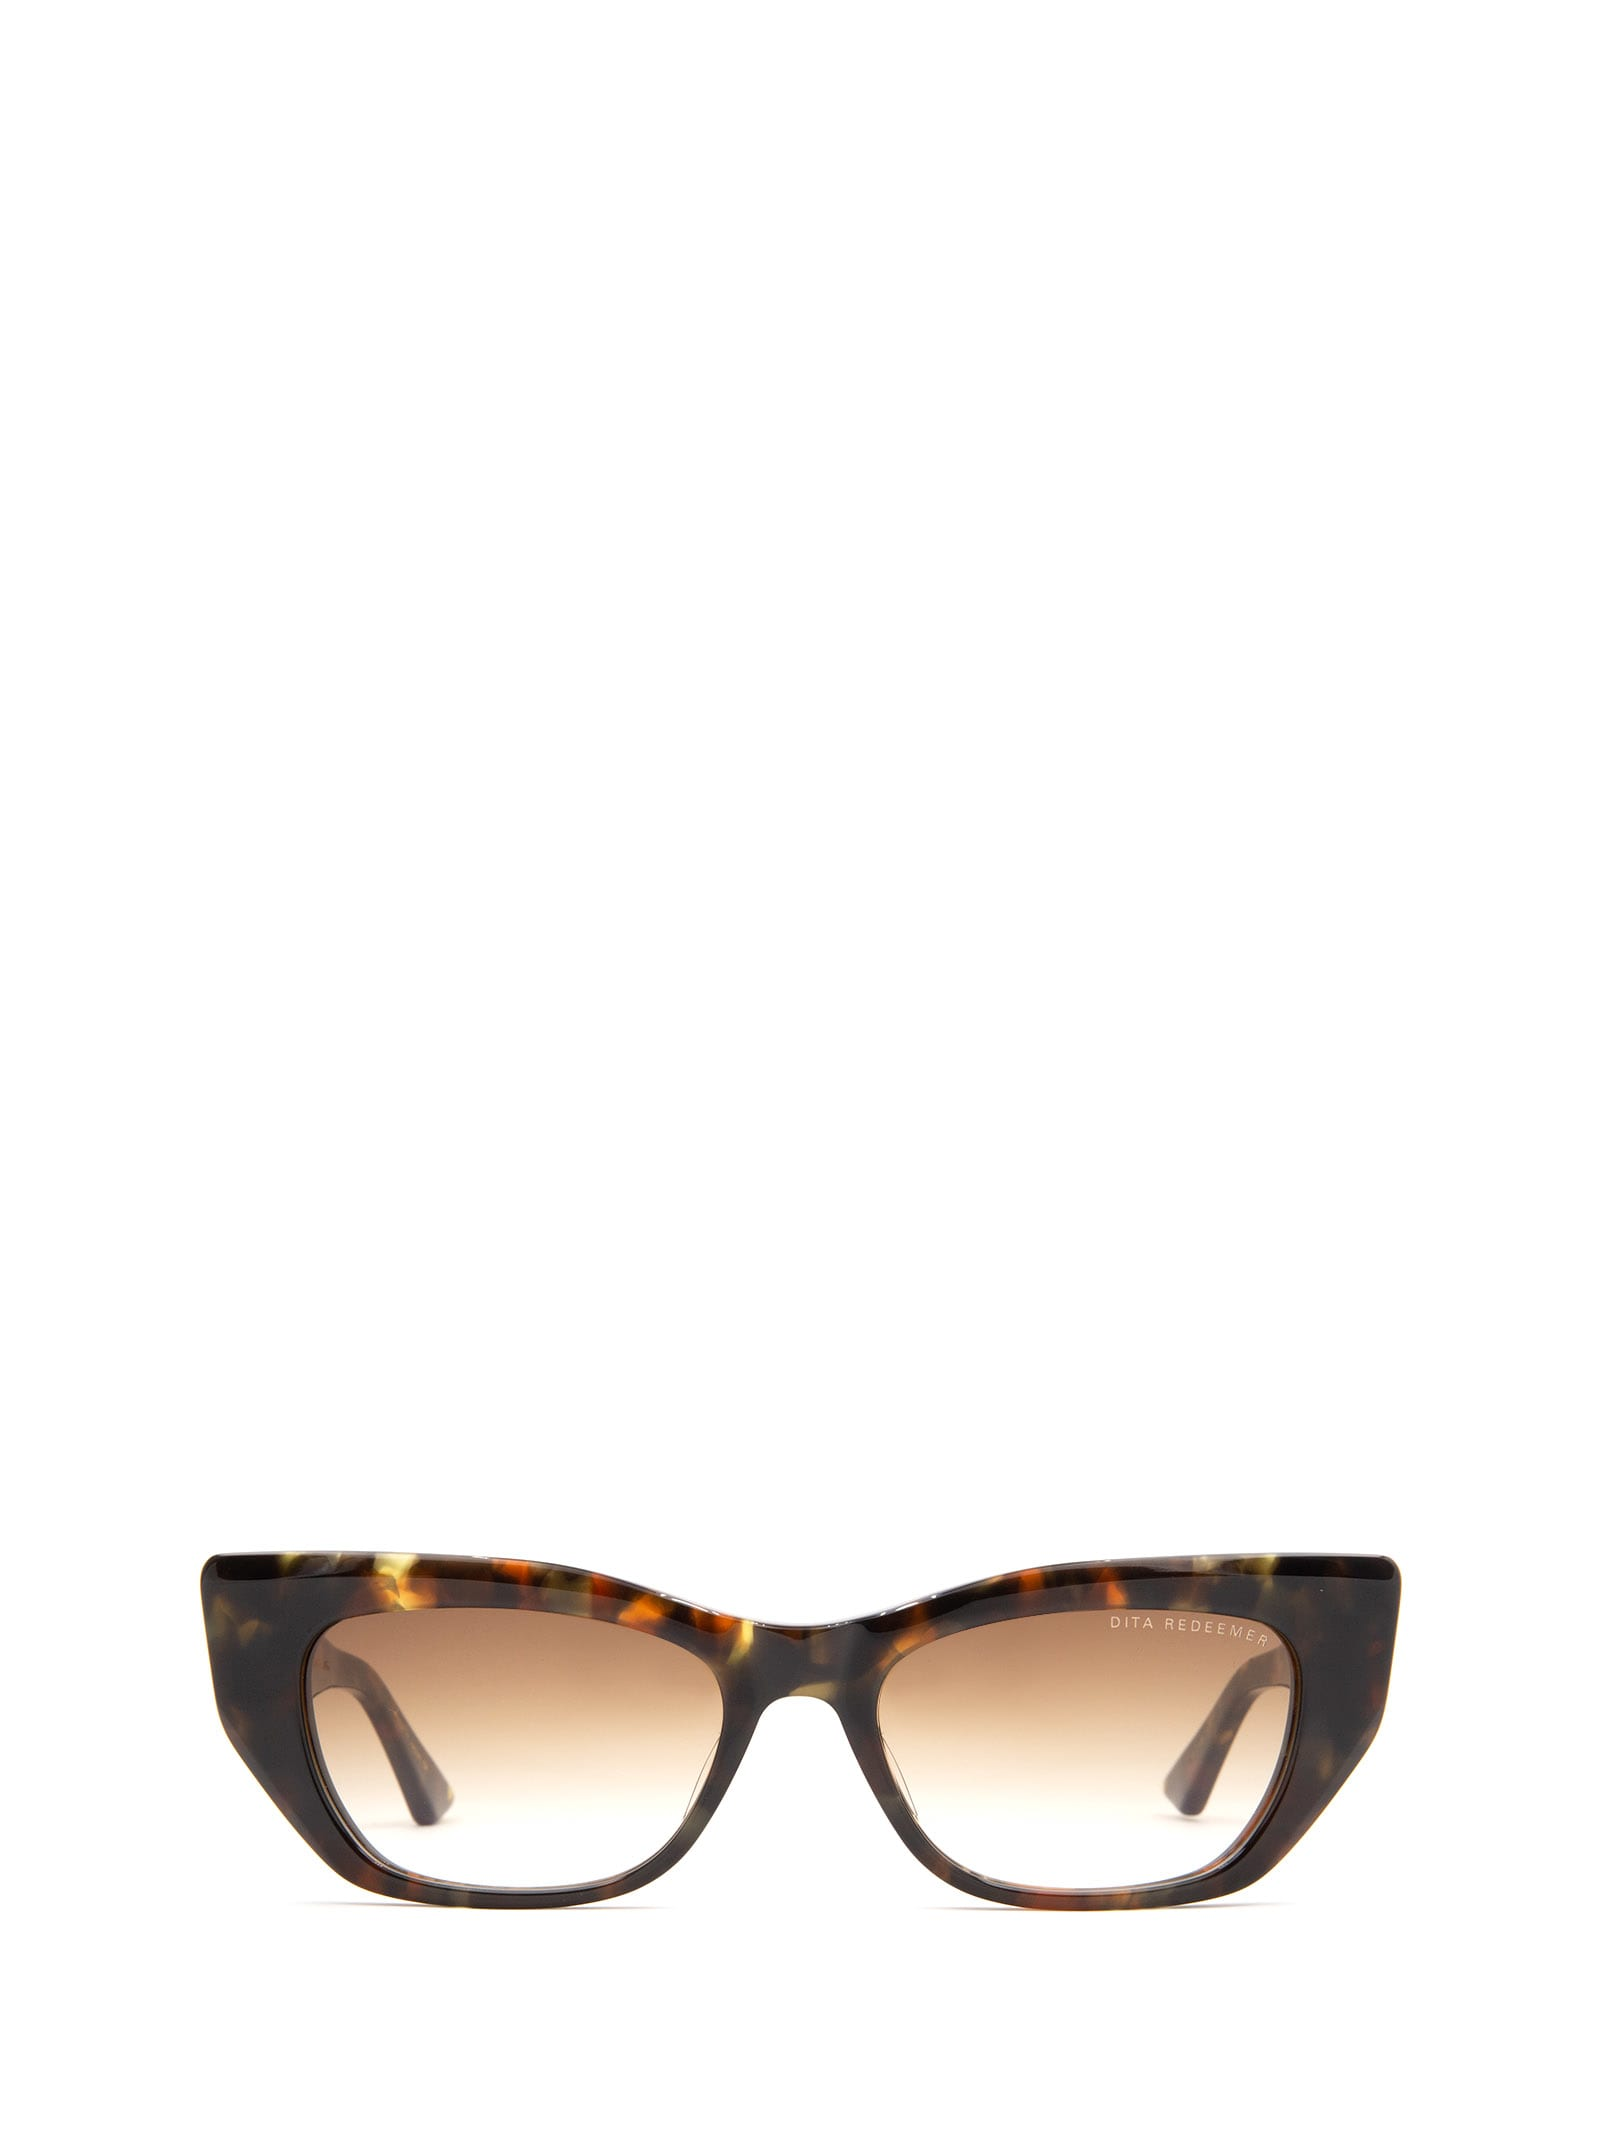 Dita Dita Dts530 Trt Sunglasses